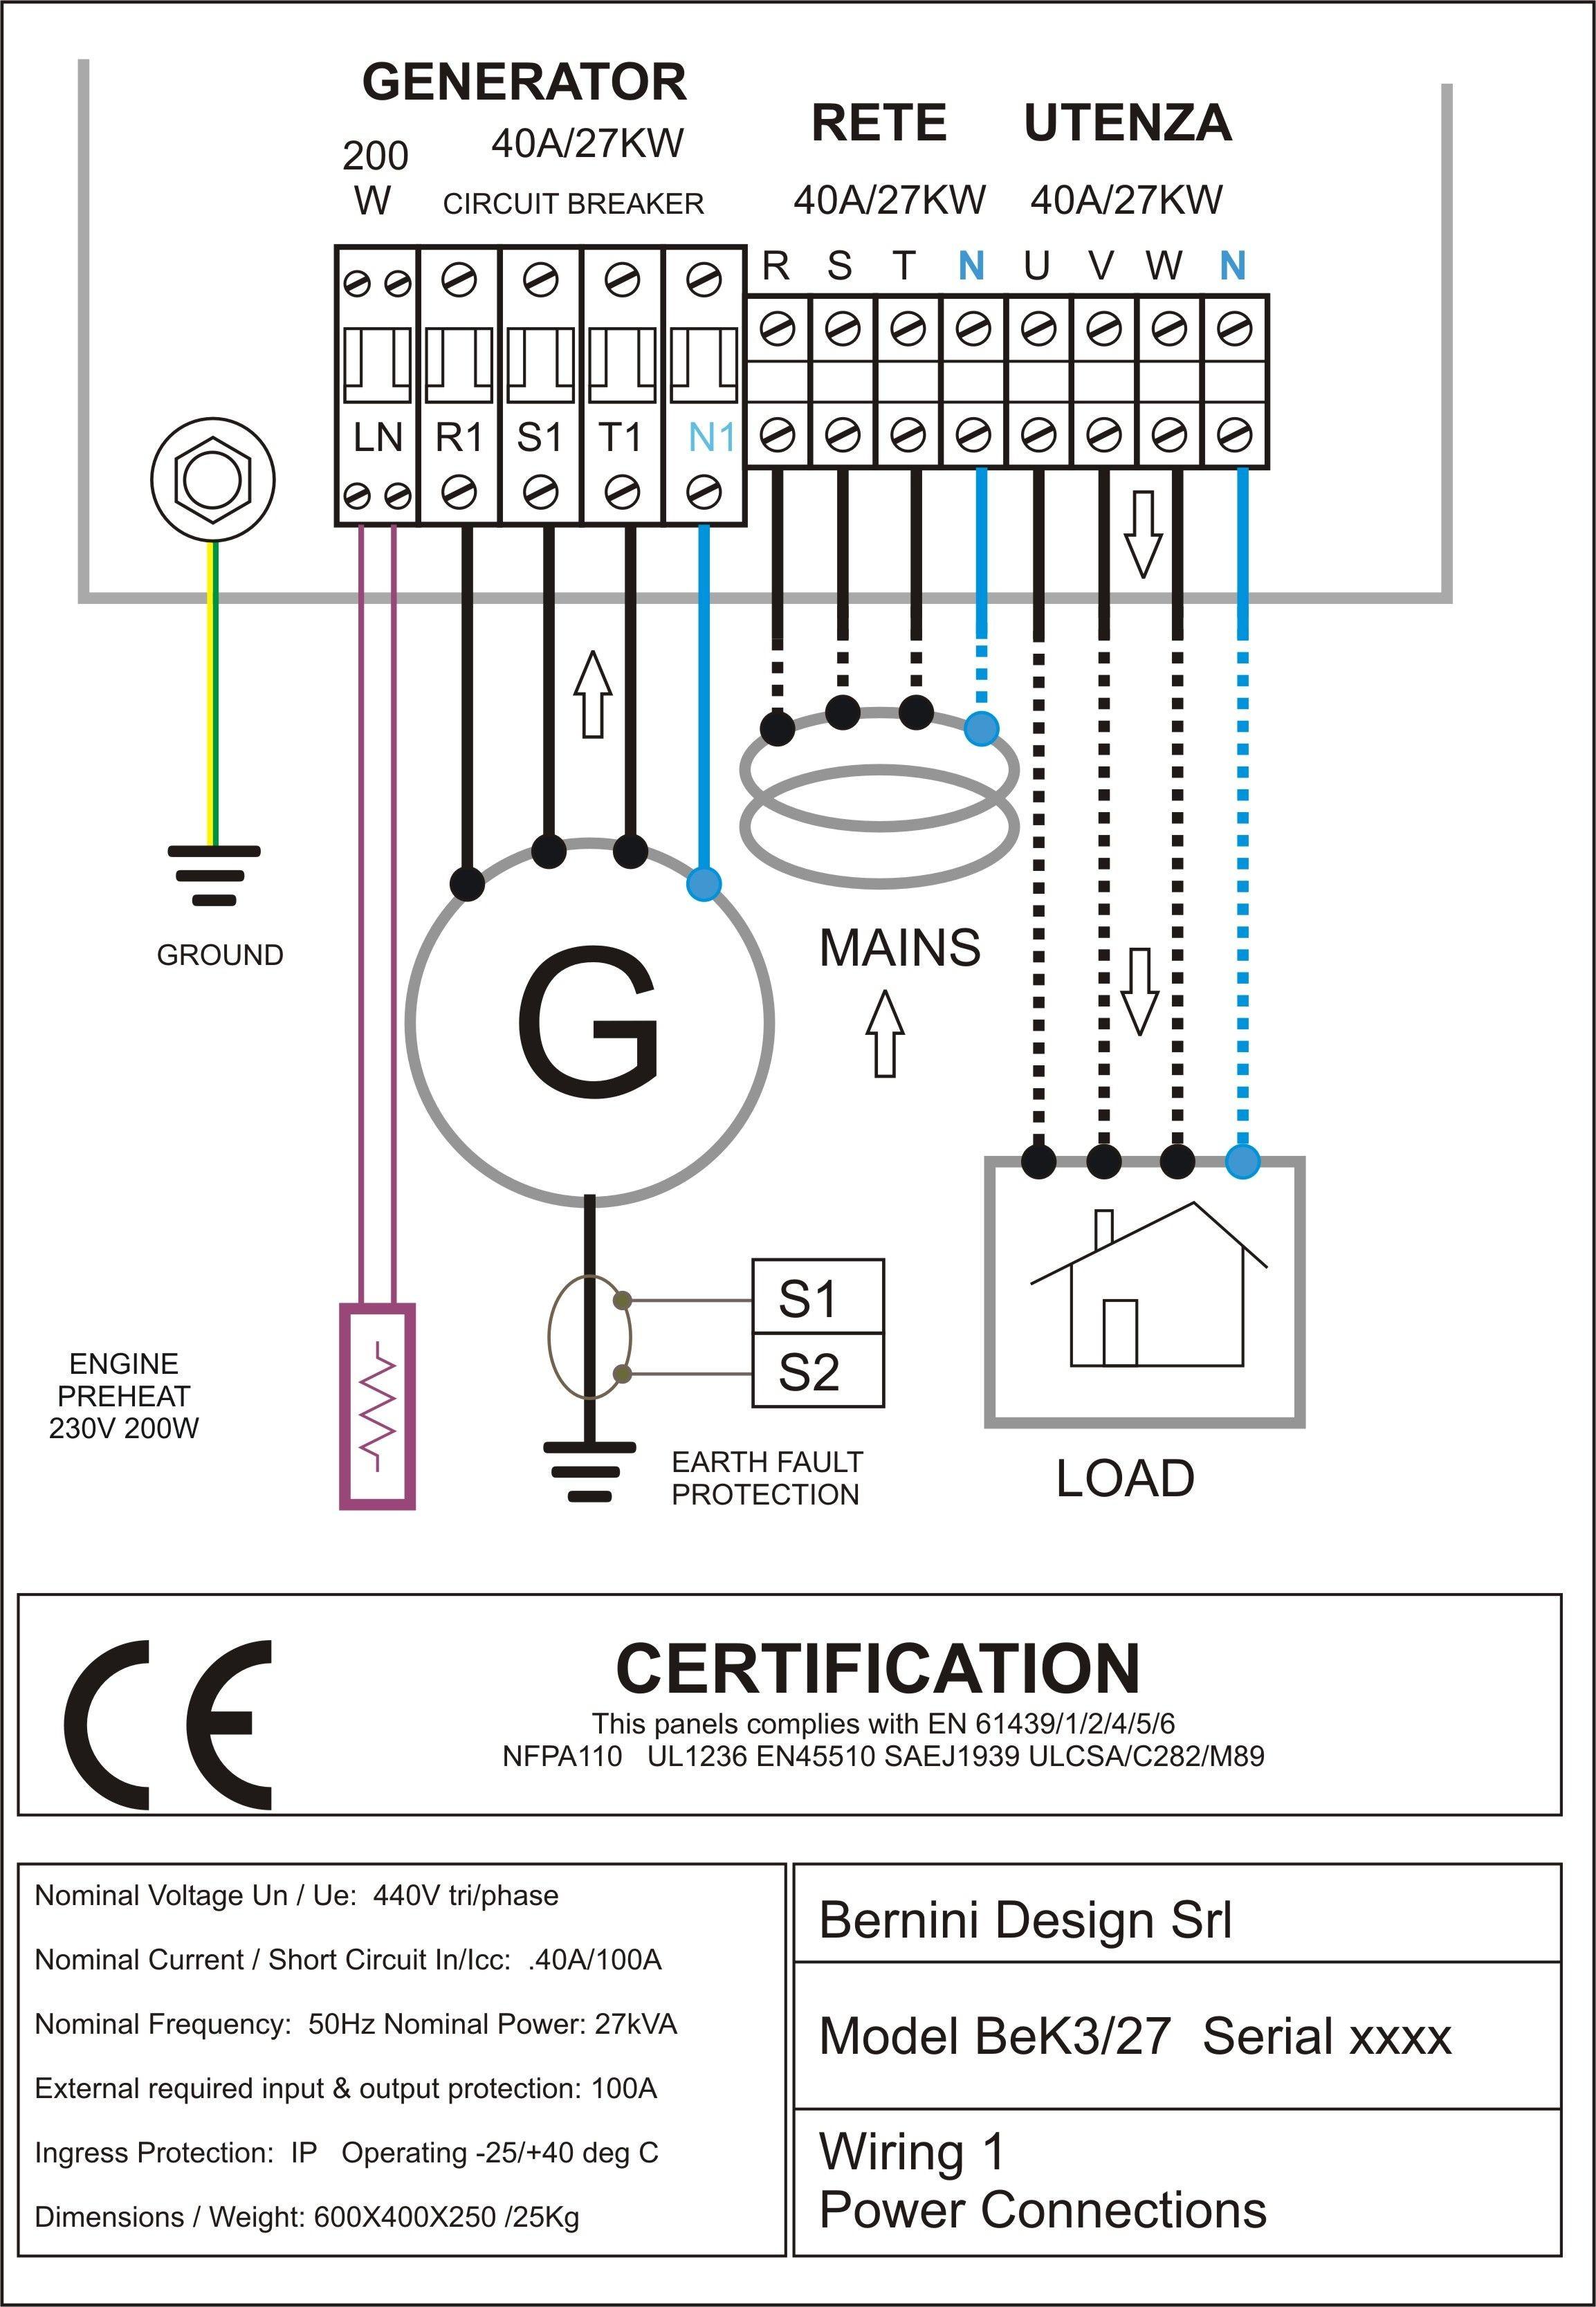 schematic diagram of diesel engine sel generator control panel rh detoxicrecenze com V6 Engine Diagram V6 Engine Diagram